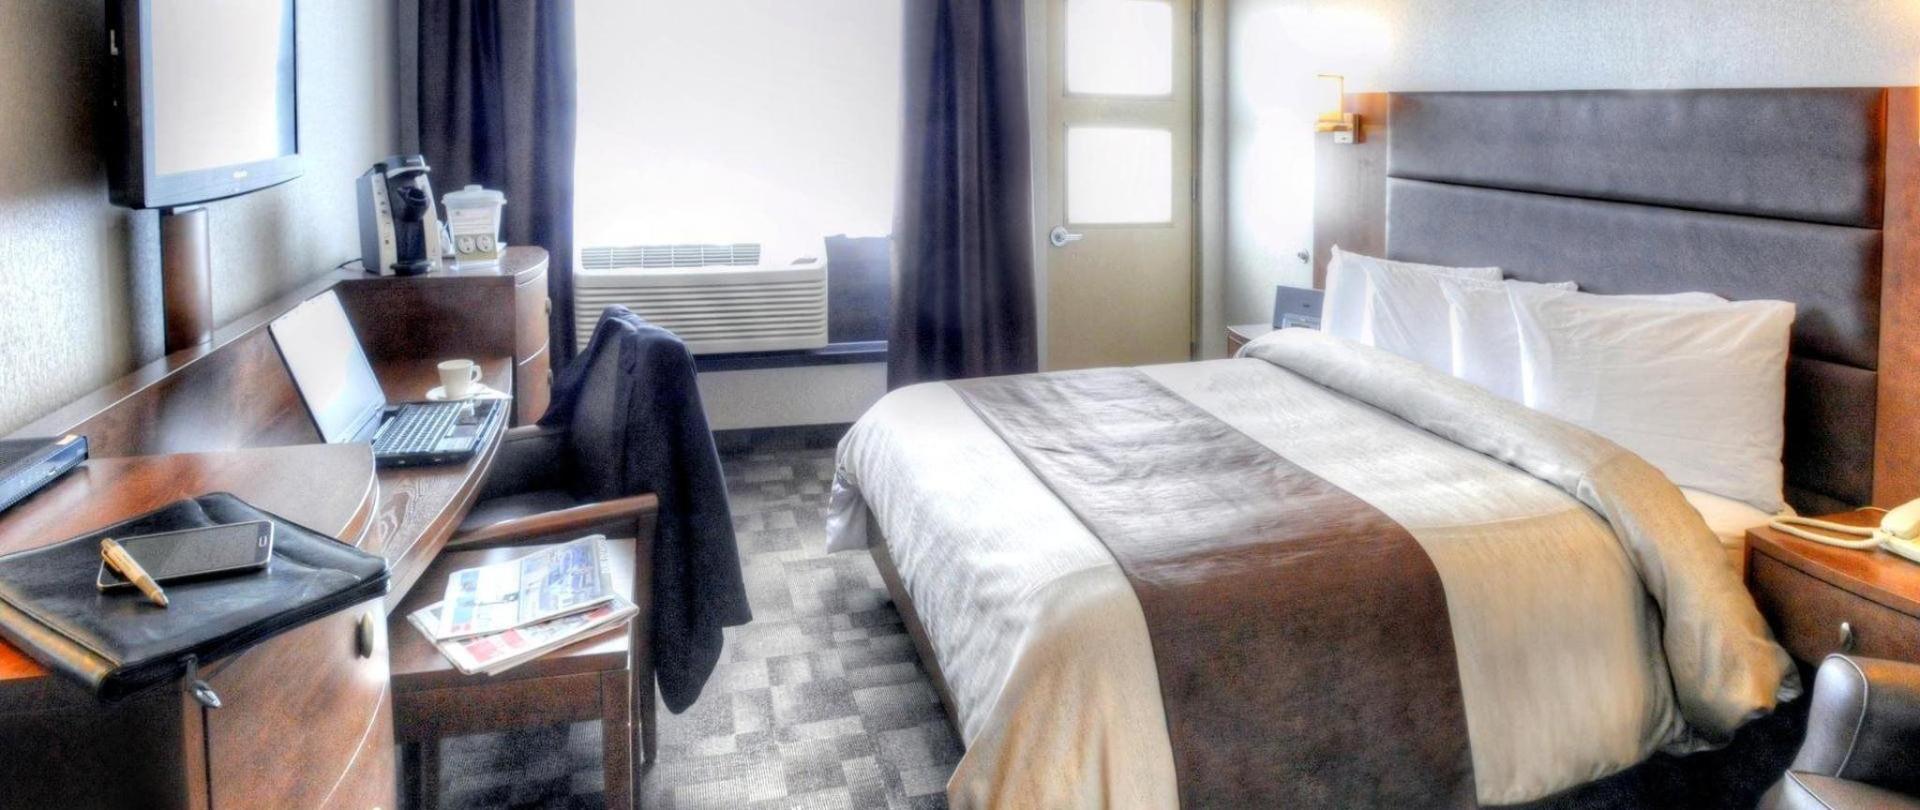 continental-3-superior-room.jpg